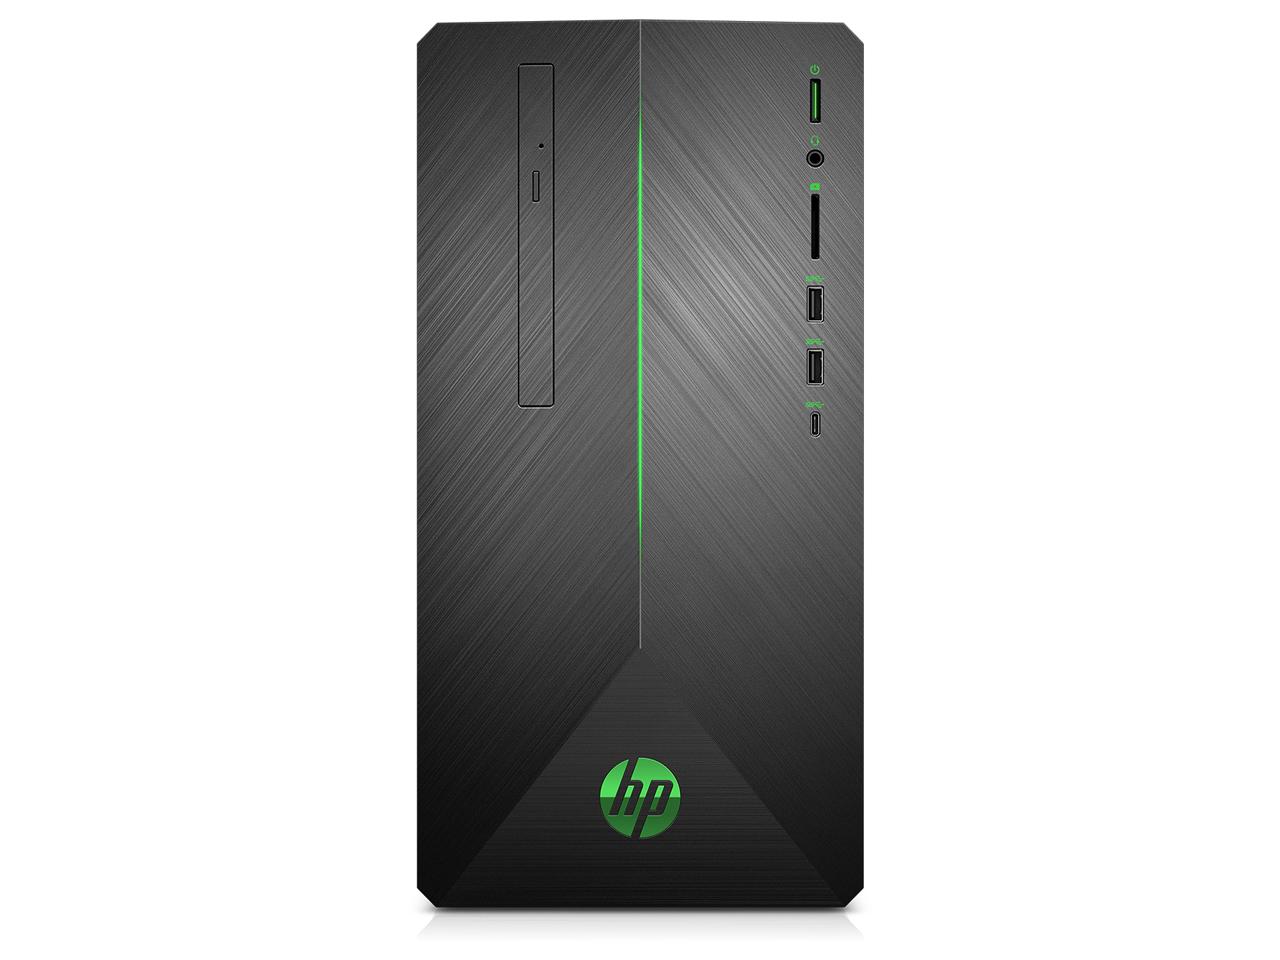 Pavilion Gaming Desktop 690-0072jp 価格.com限定 Core i7/GTX1660/2TB HDD+256GB SSD/16GBメモリ パフォーマンスモデル